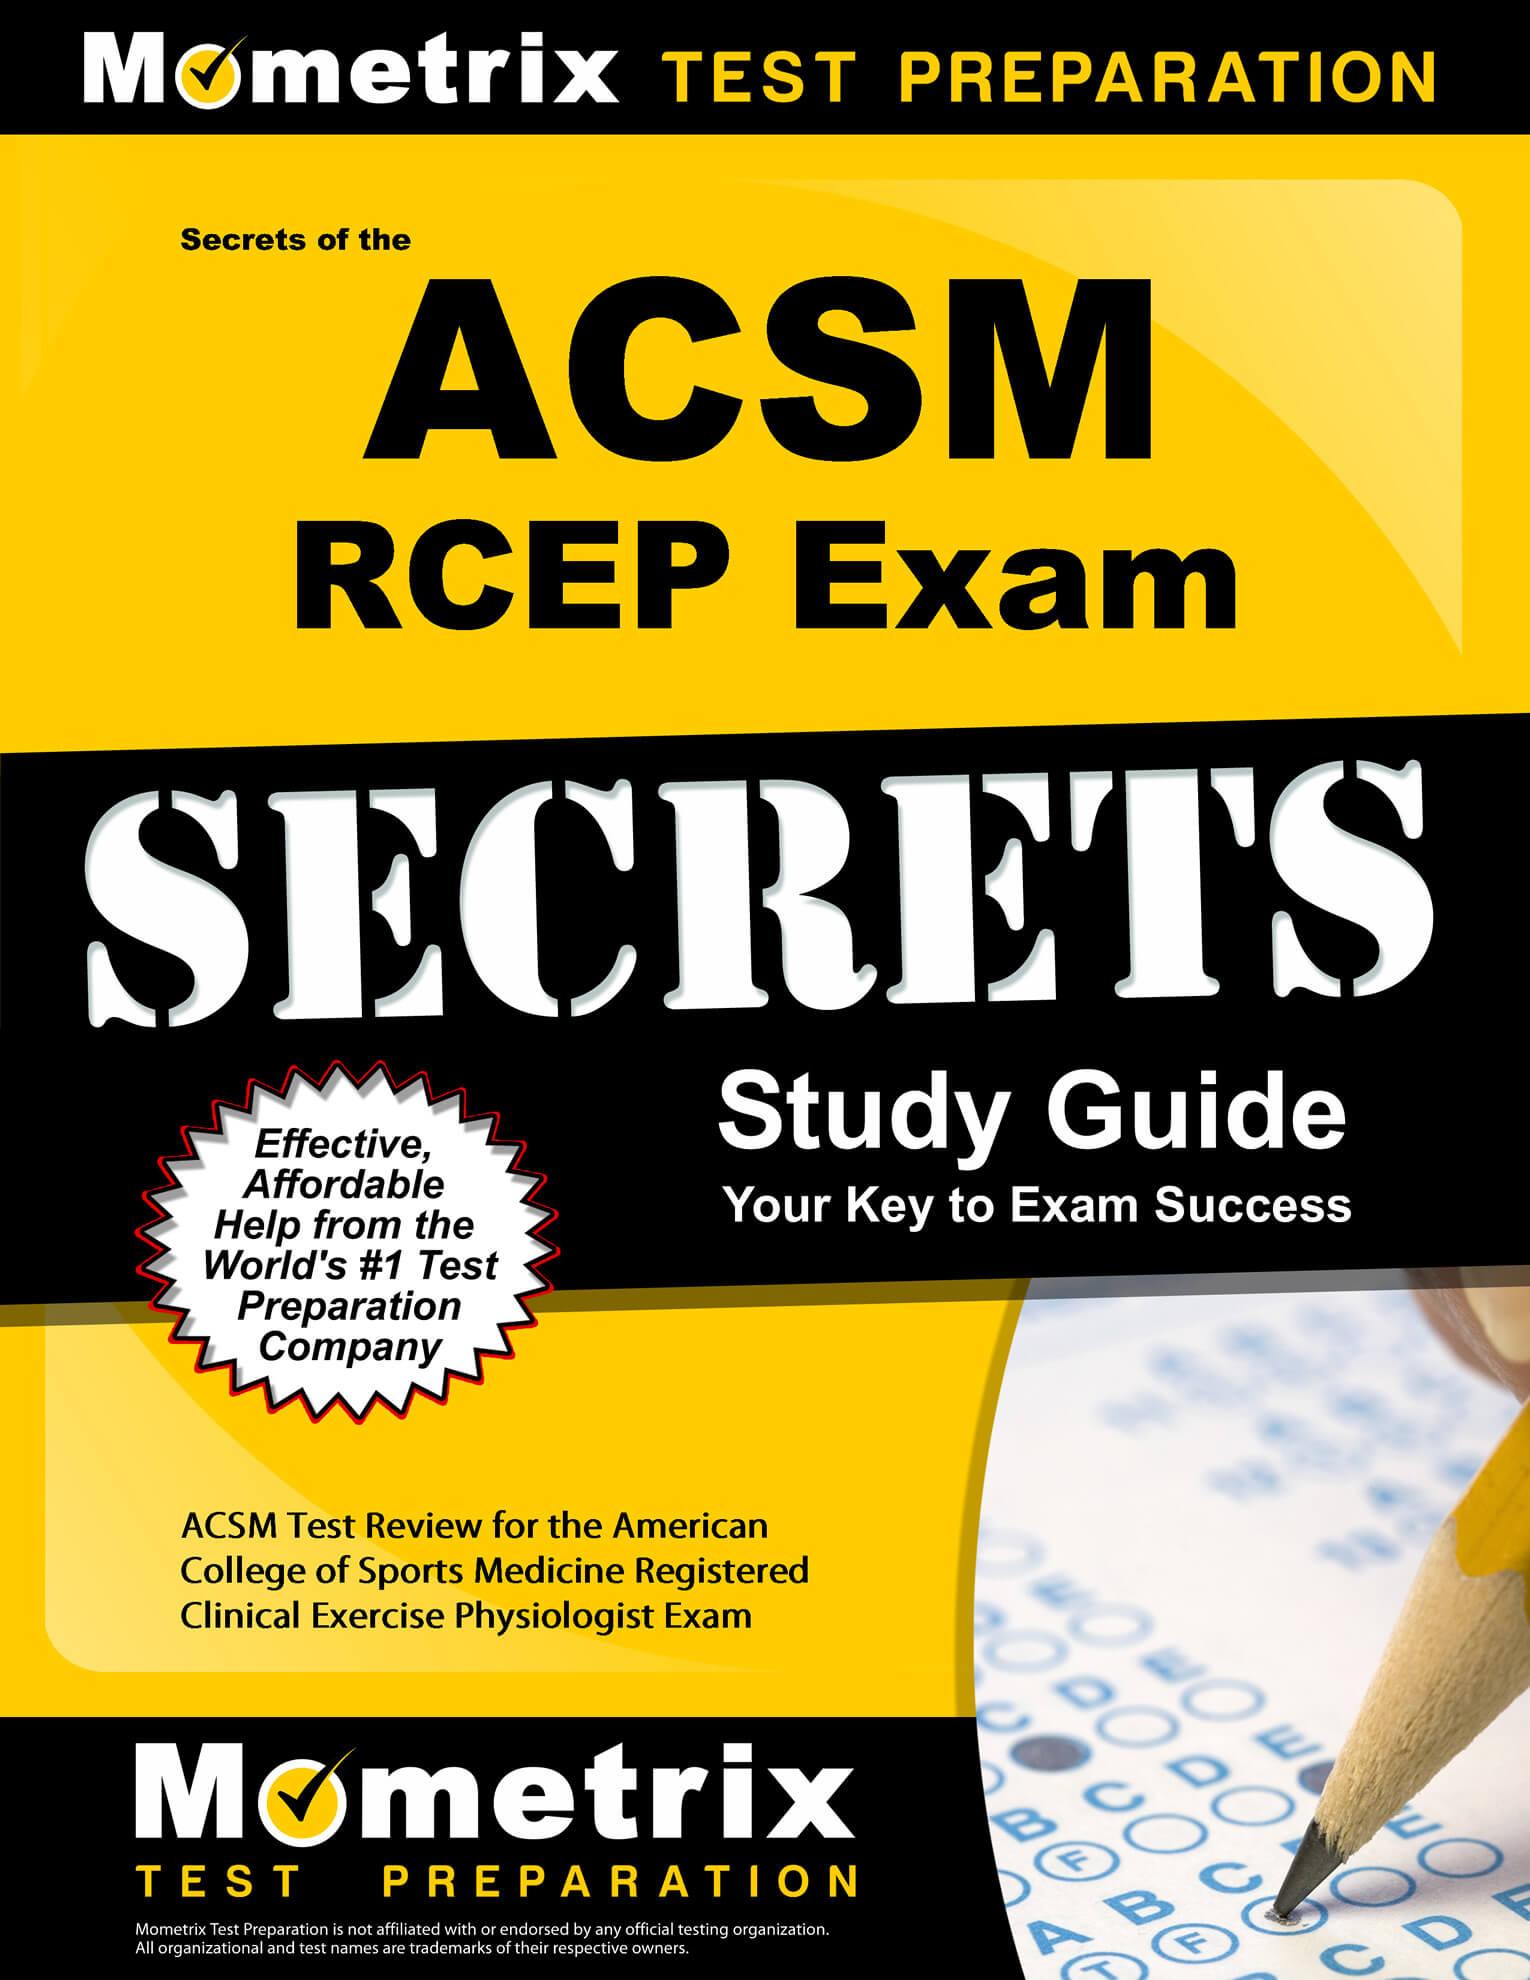 ACSM Test Prep Help (updated 2019)